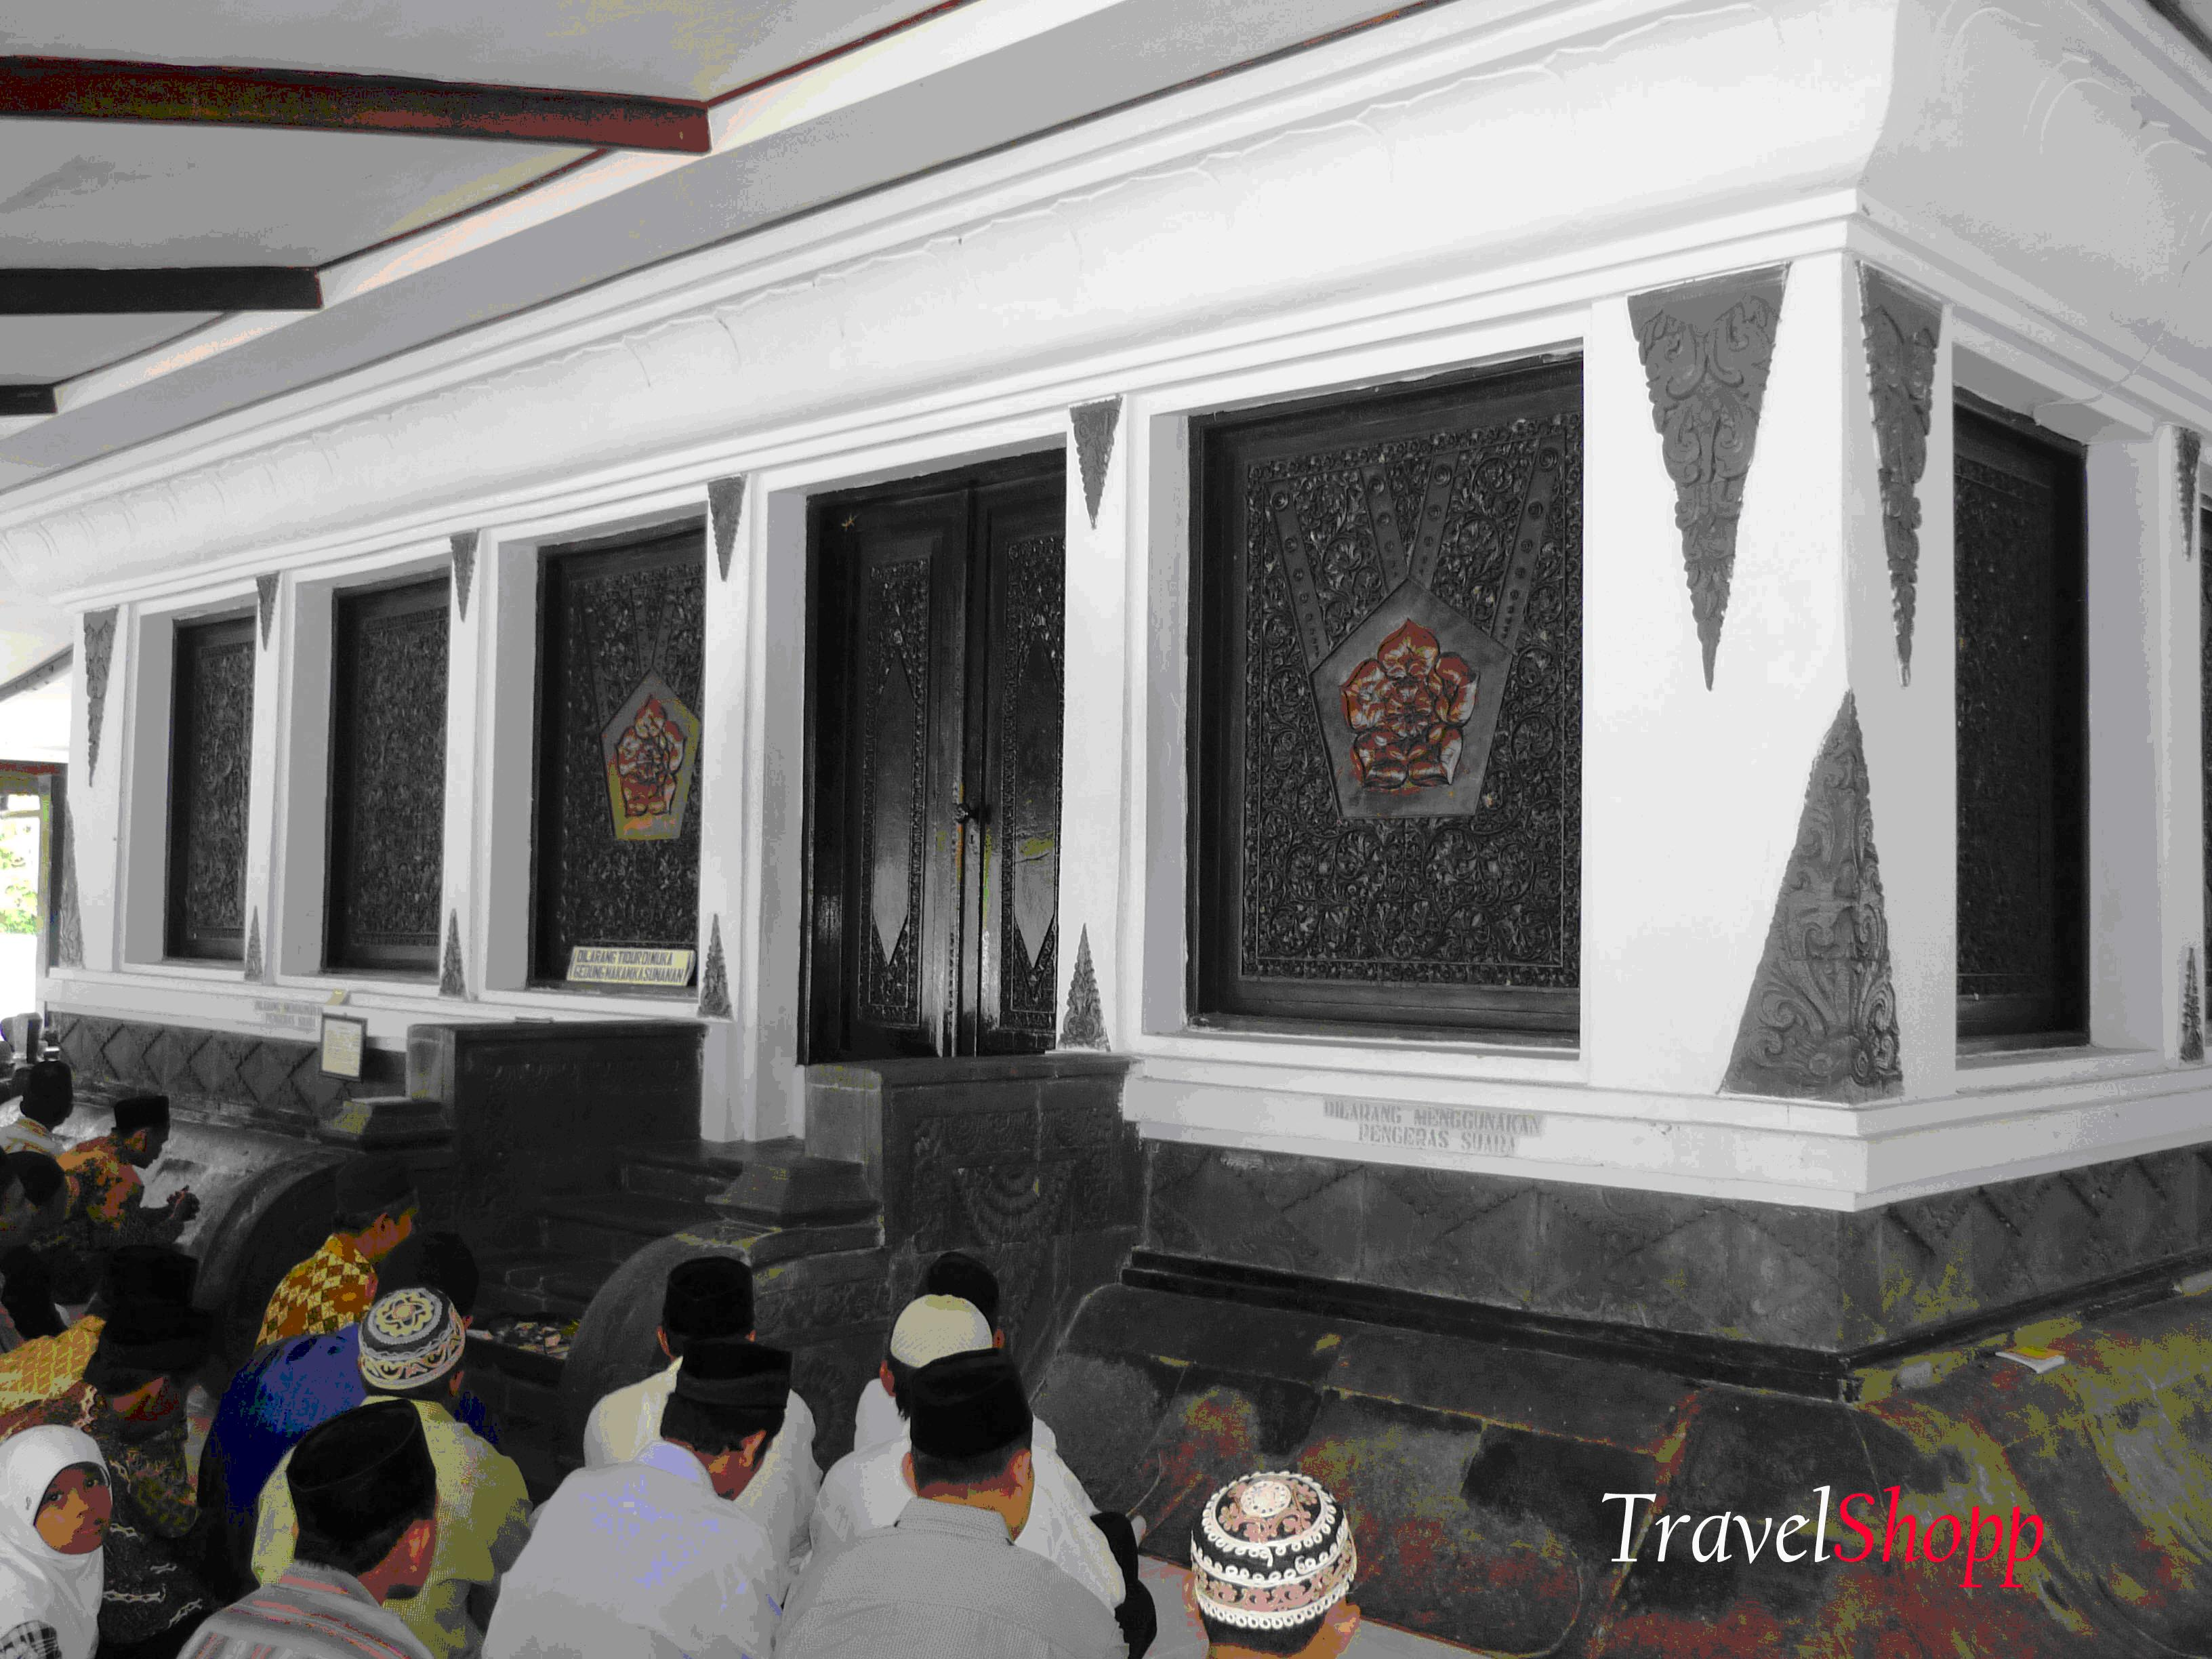 Studi Disain Makam Penyebar Agama Islam Artikeltulisan Sunan Giri Lokasi